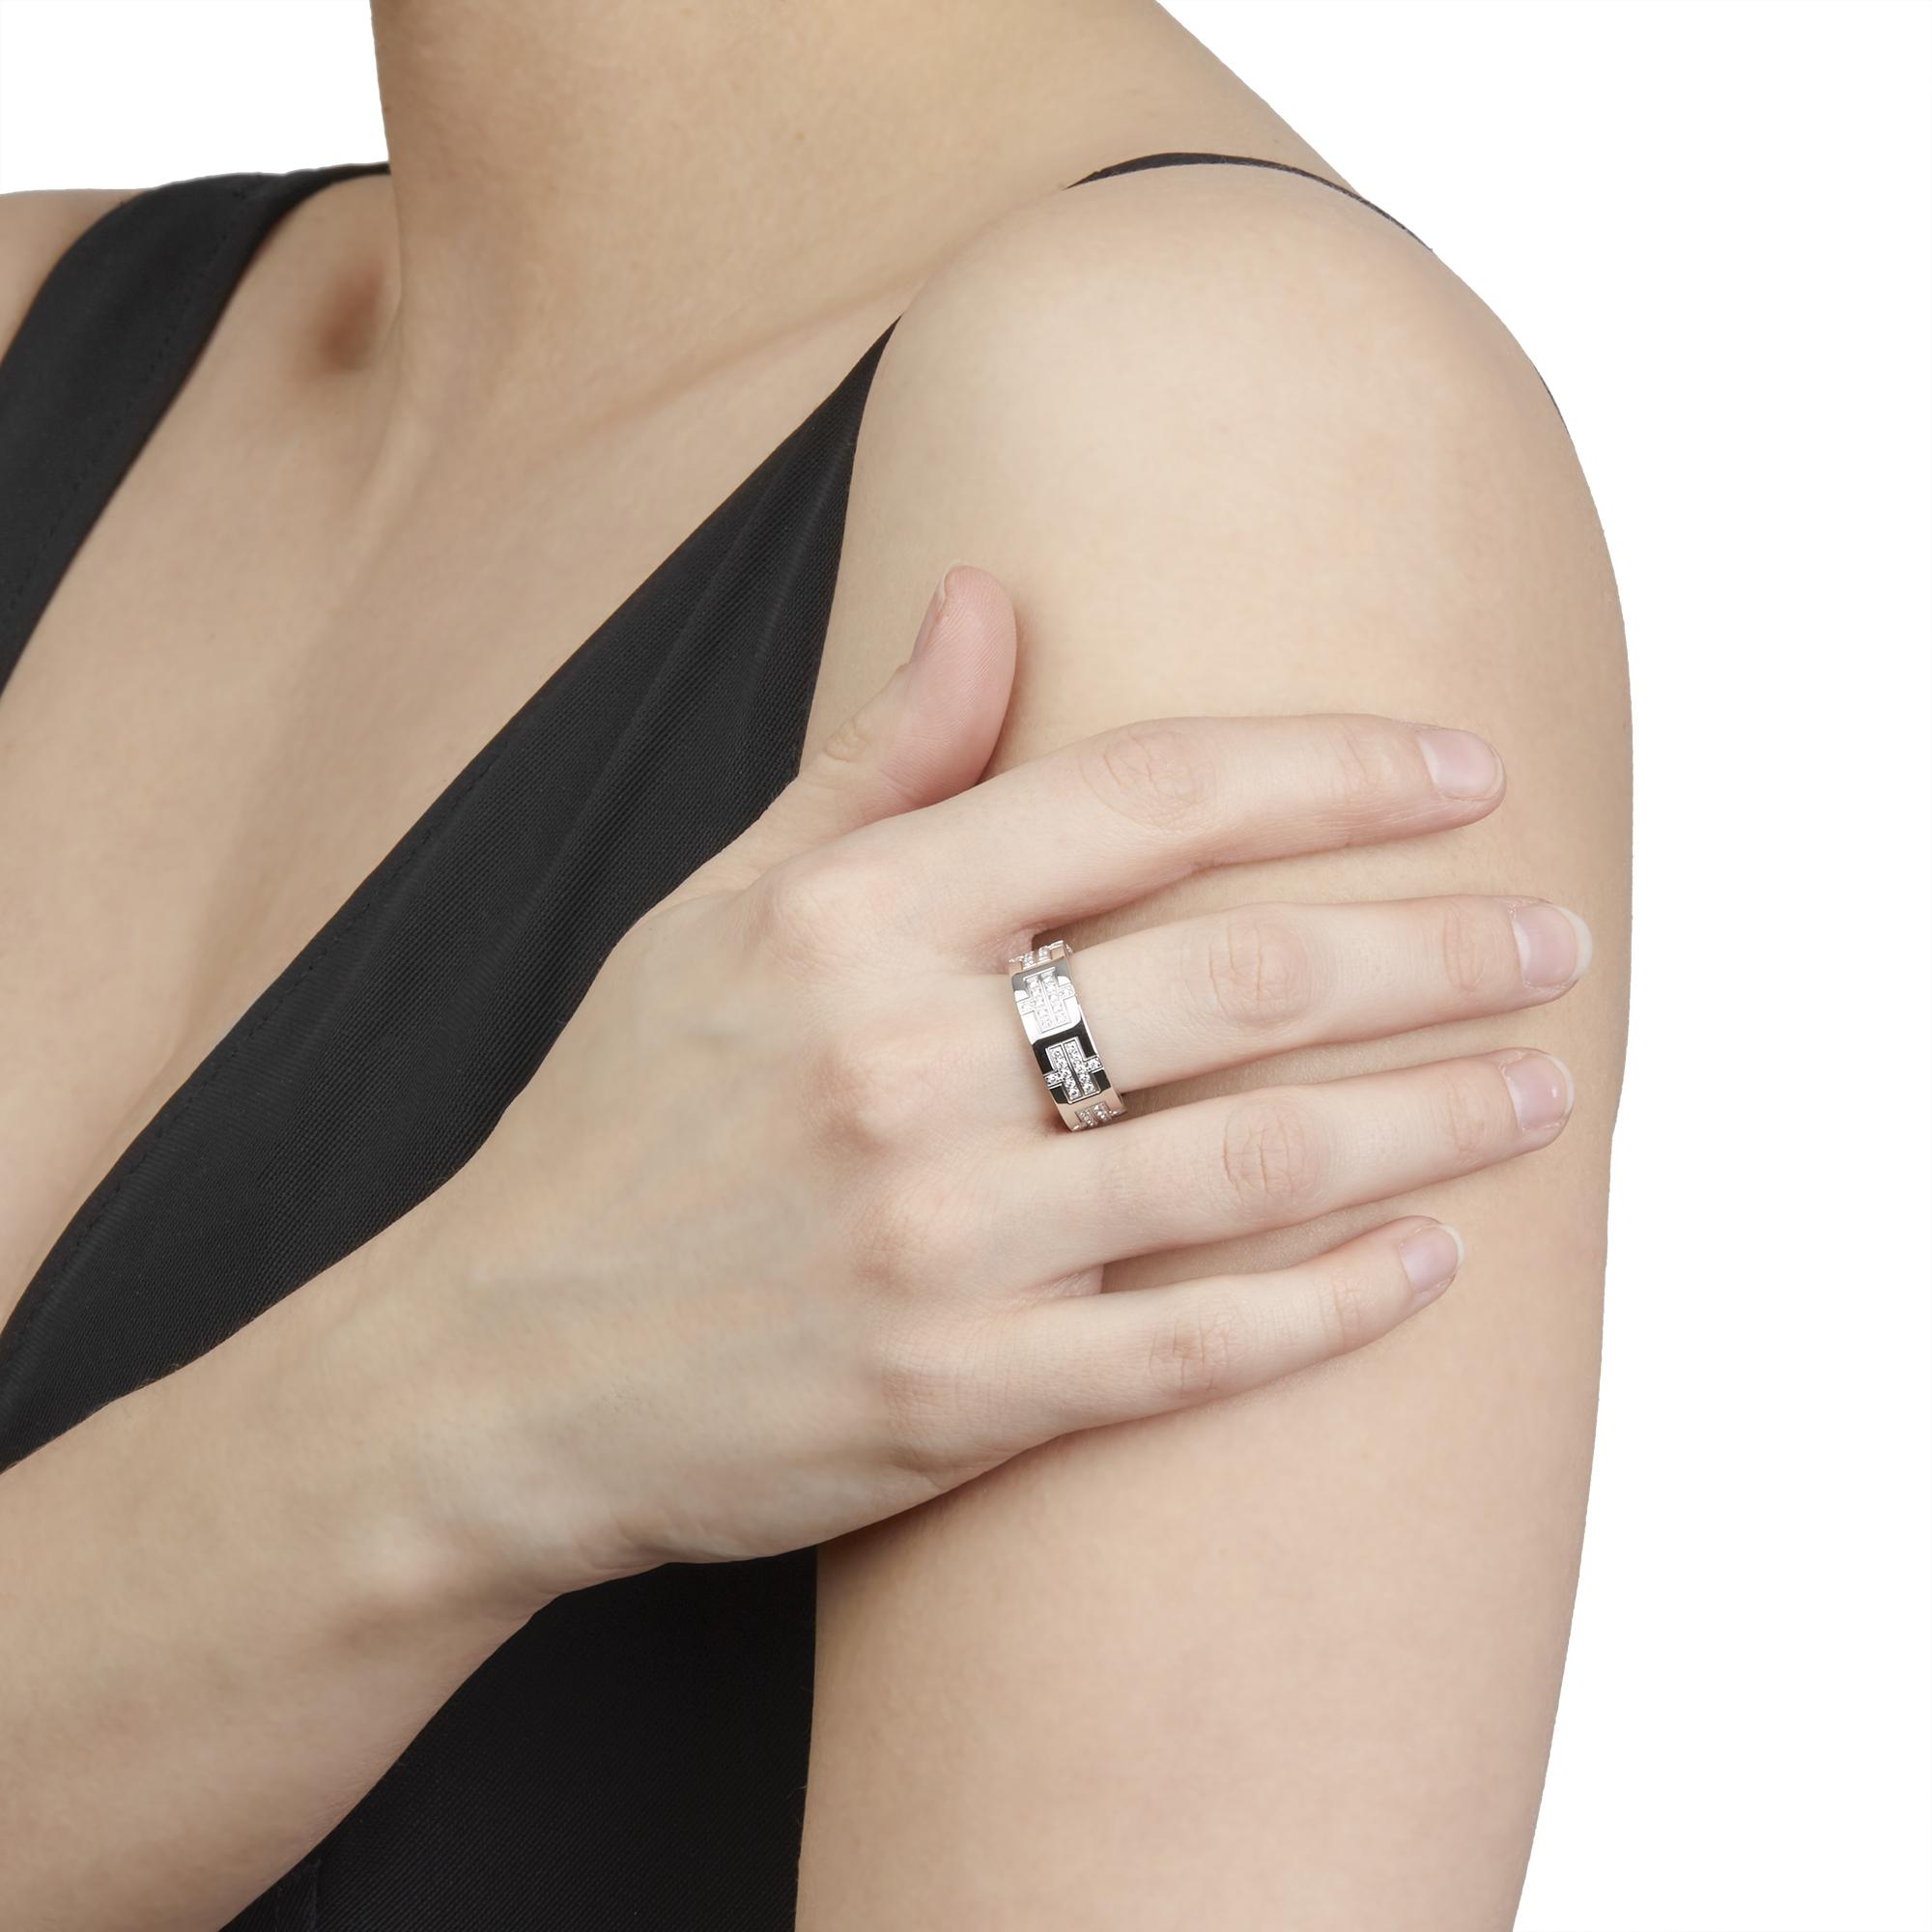 Hermes 18ct White Gold Kilim Diamond Ring - Image 2 of 8